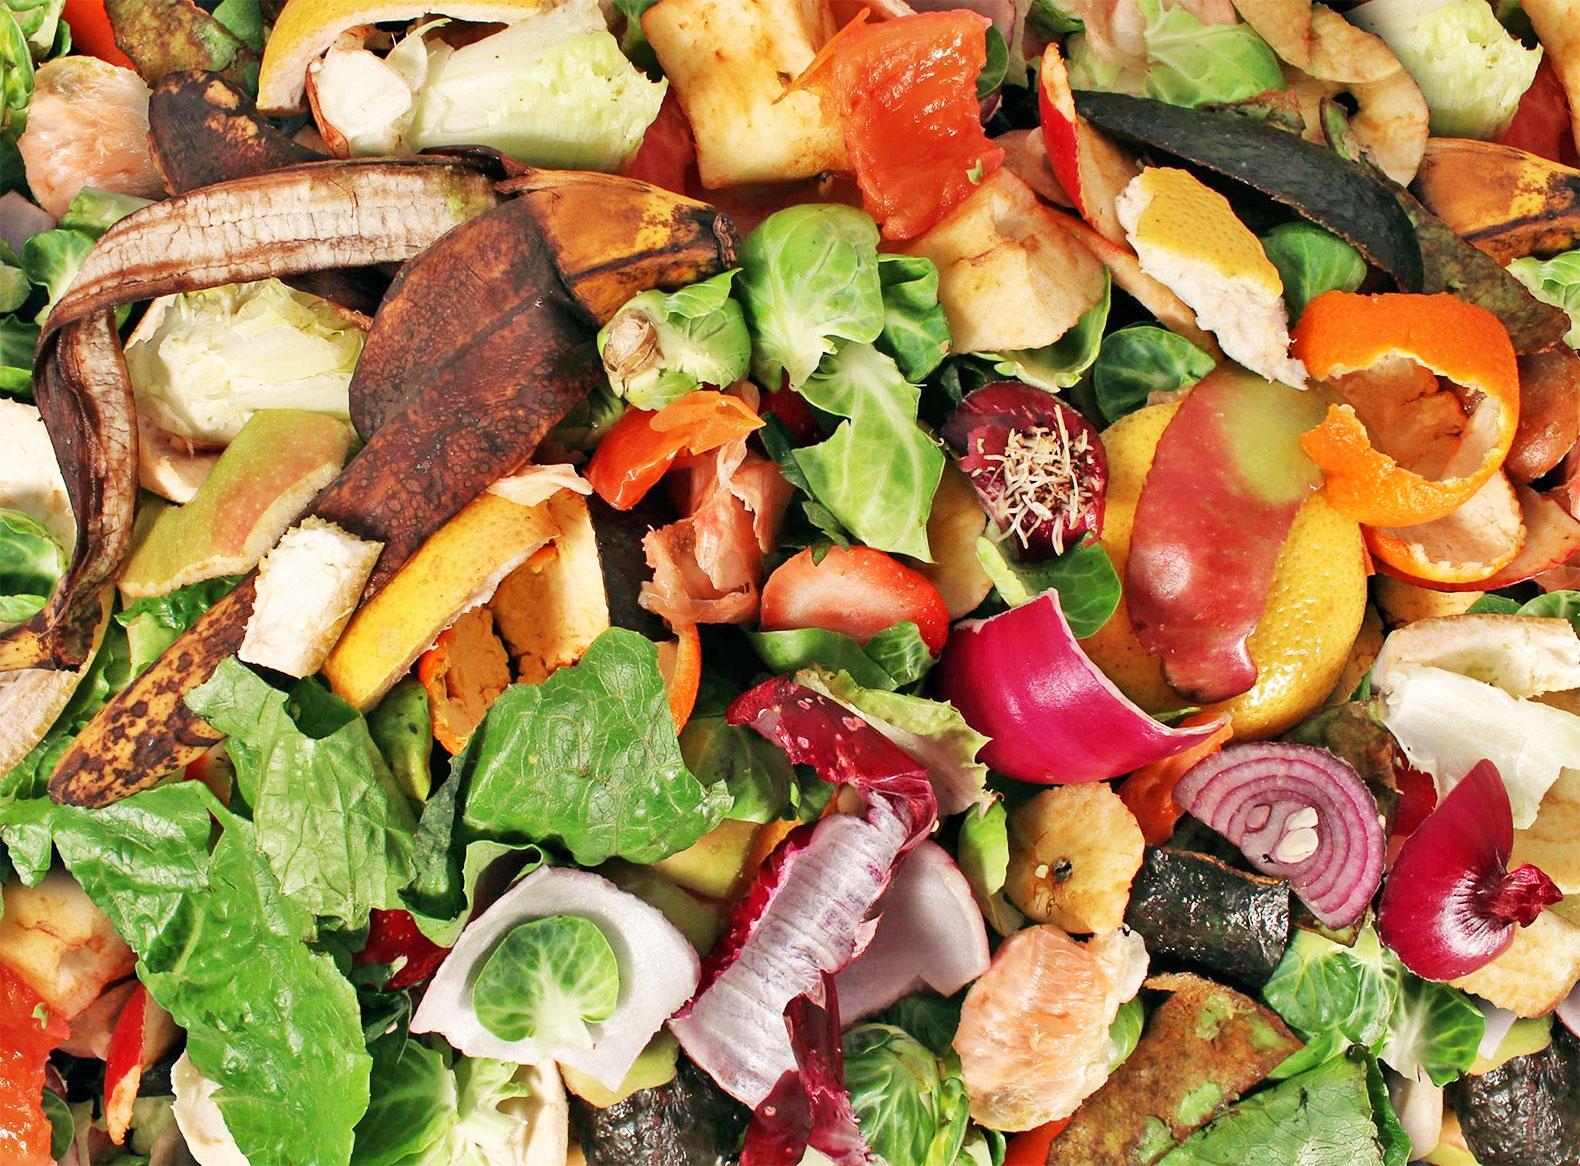 Organic Food Waste Of Money